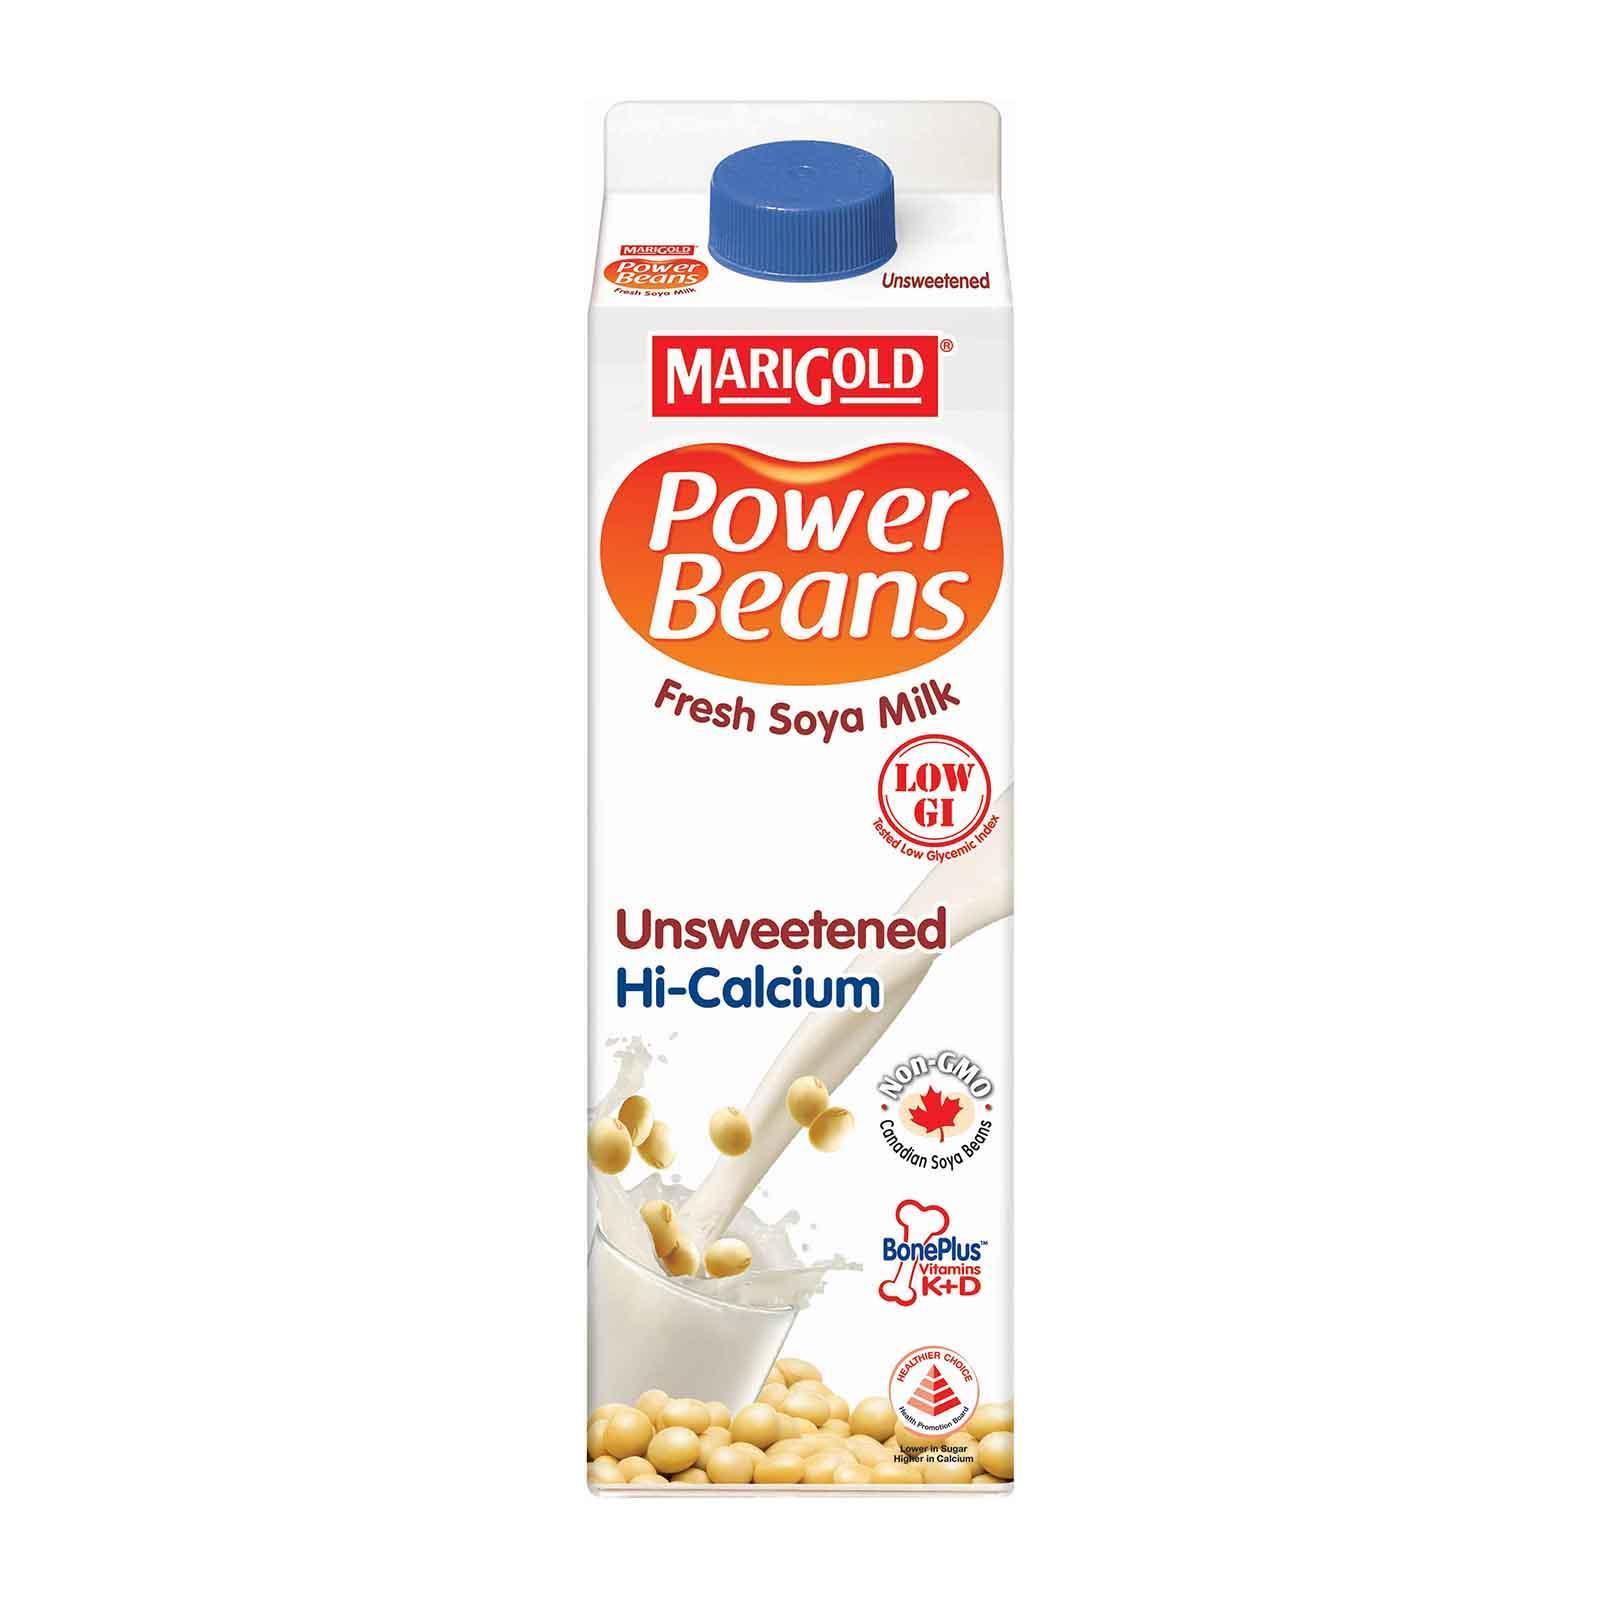 MARIGOLD PowerBeans Fresh Soya Milk - Unsweetened 1L